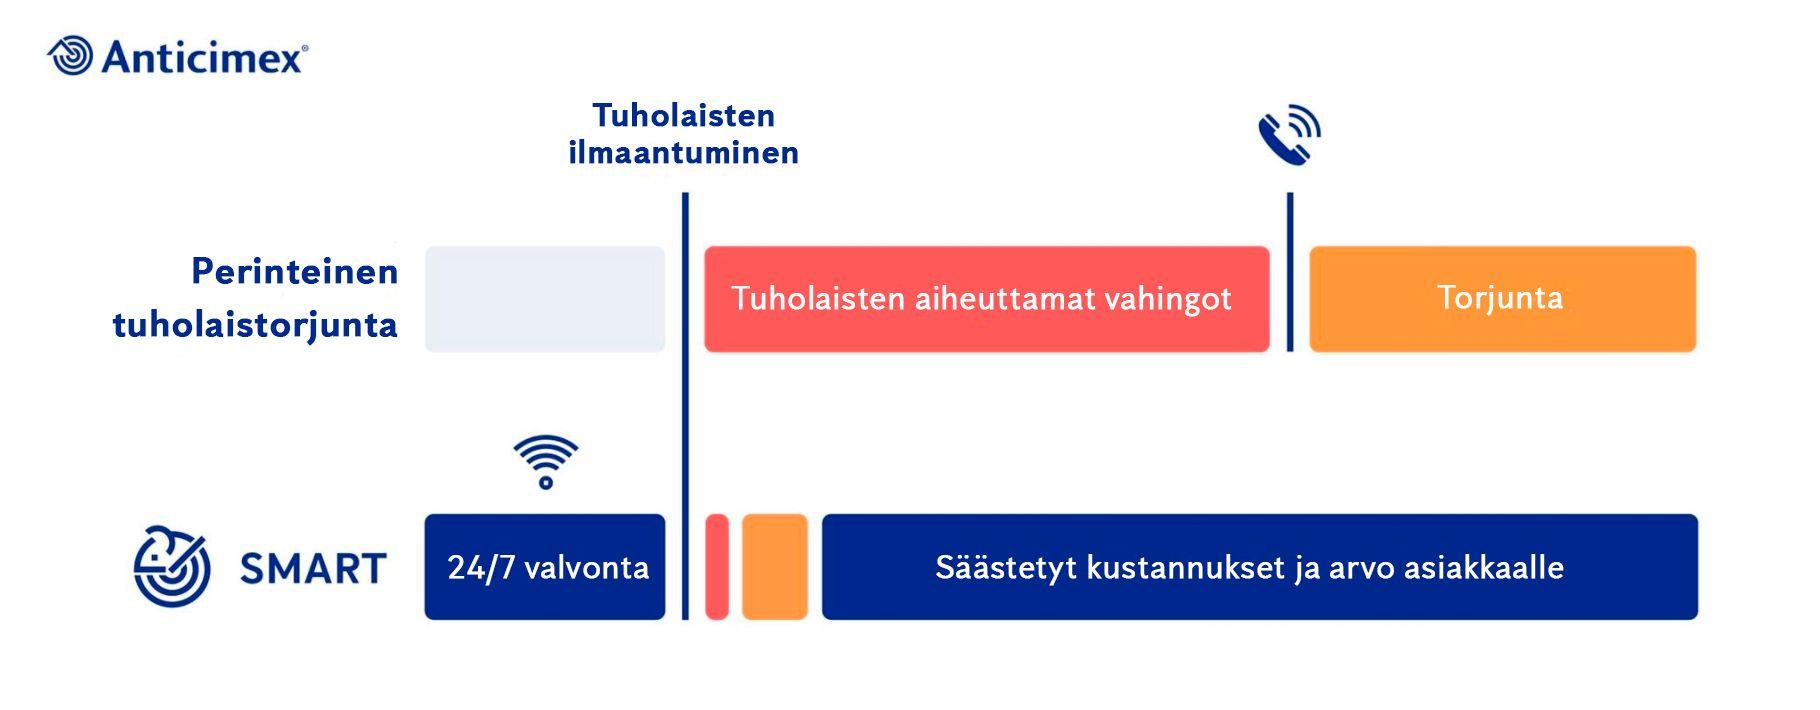 Perinteinen tuholaistorjunta vs. Anticimex Smart